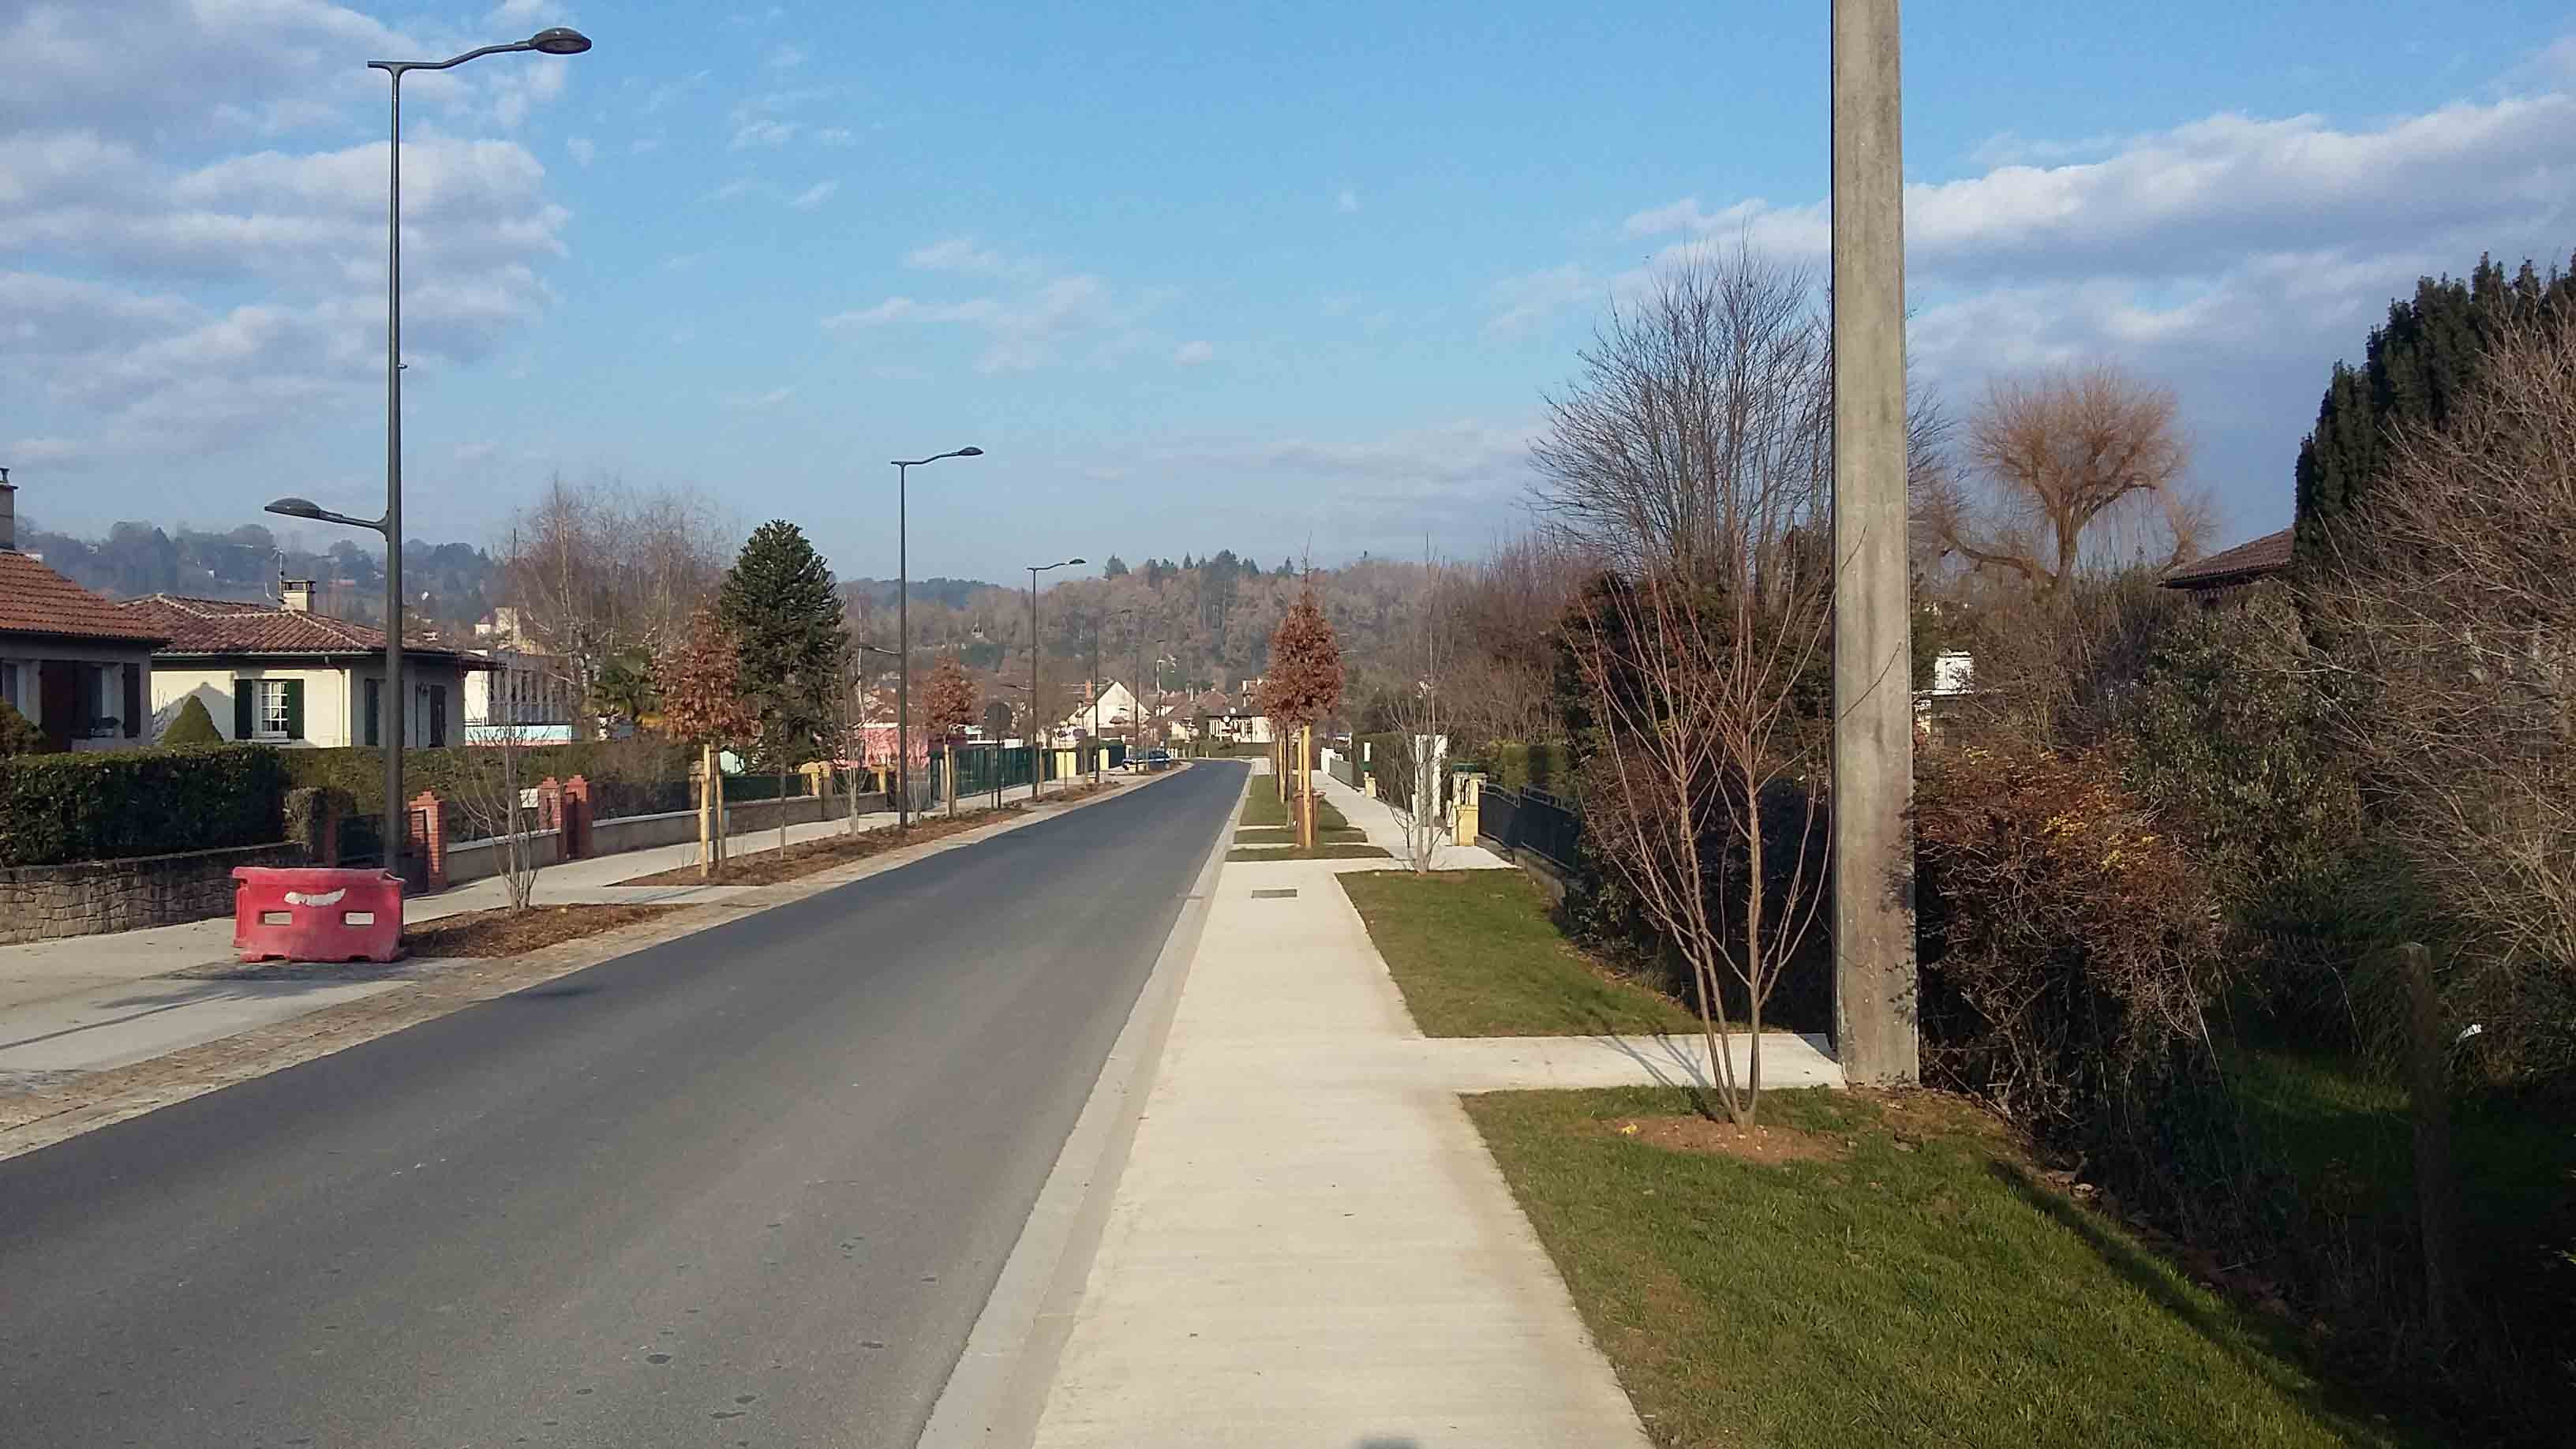 Aménagement urbain voiries Montignac 12